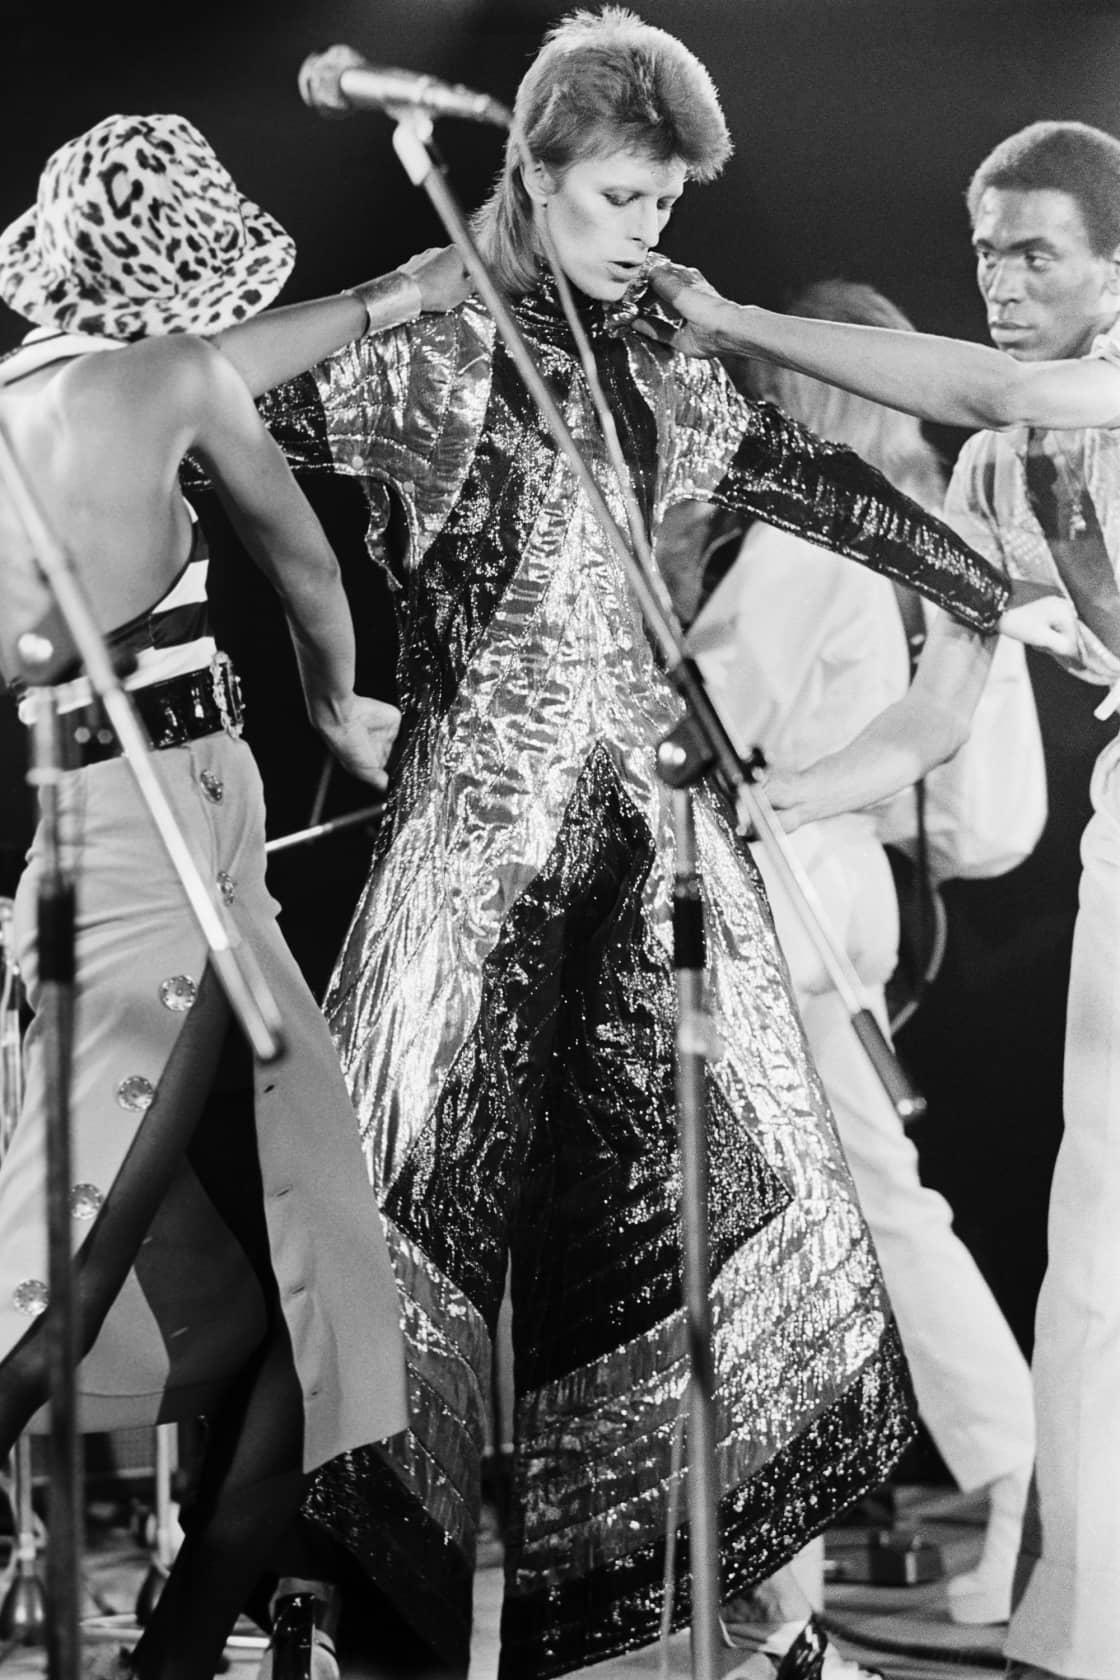 Terry O'Neill David Bowie as Ziggy Stardust Lifetime Gelatin Silver Print